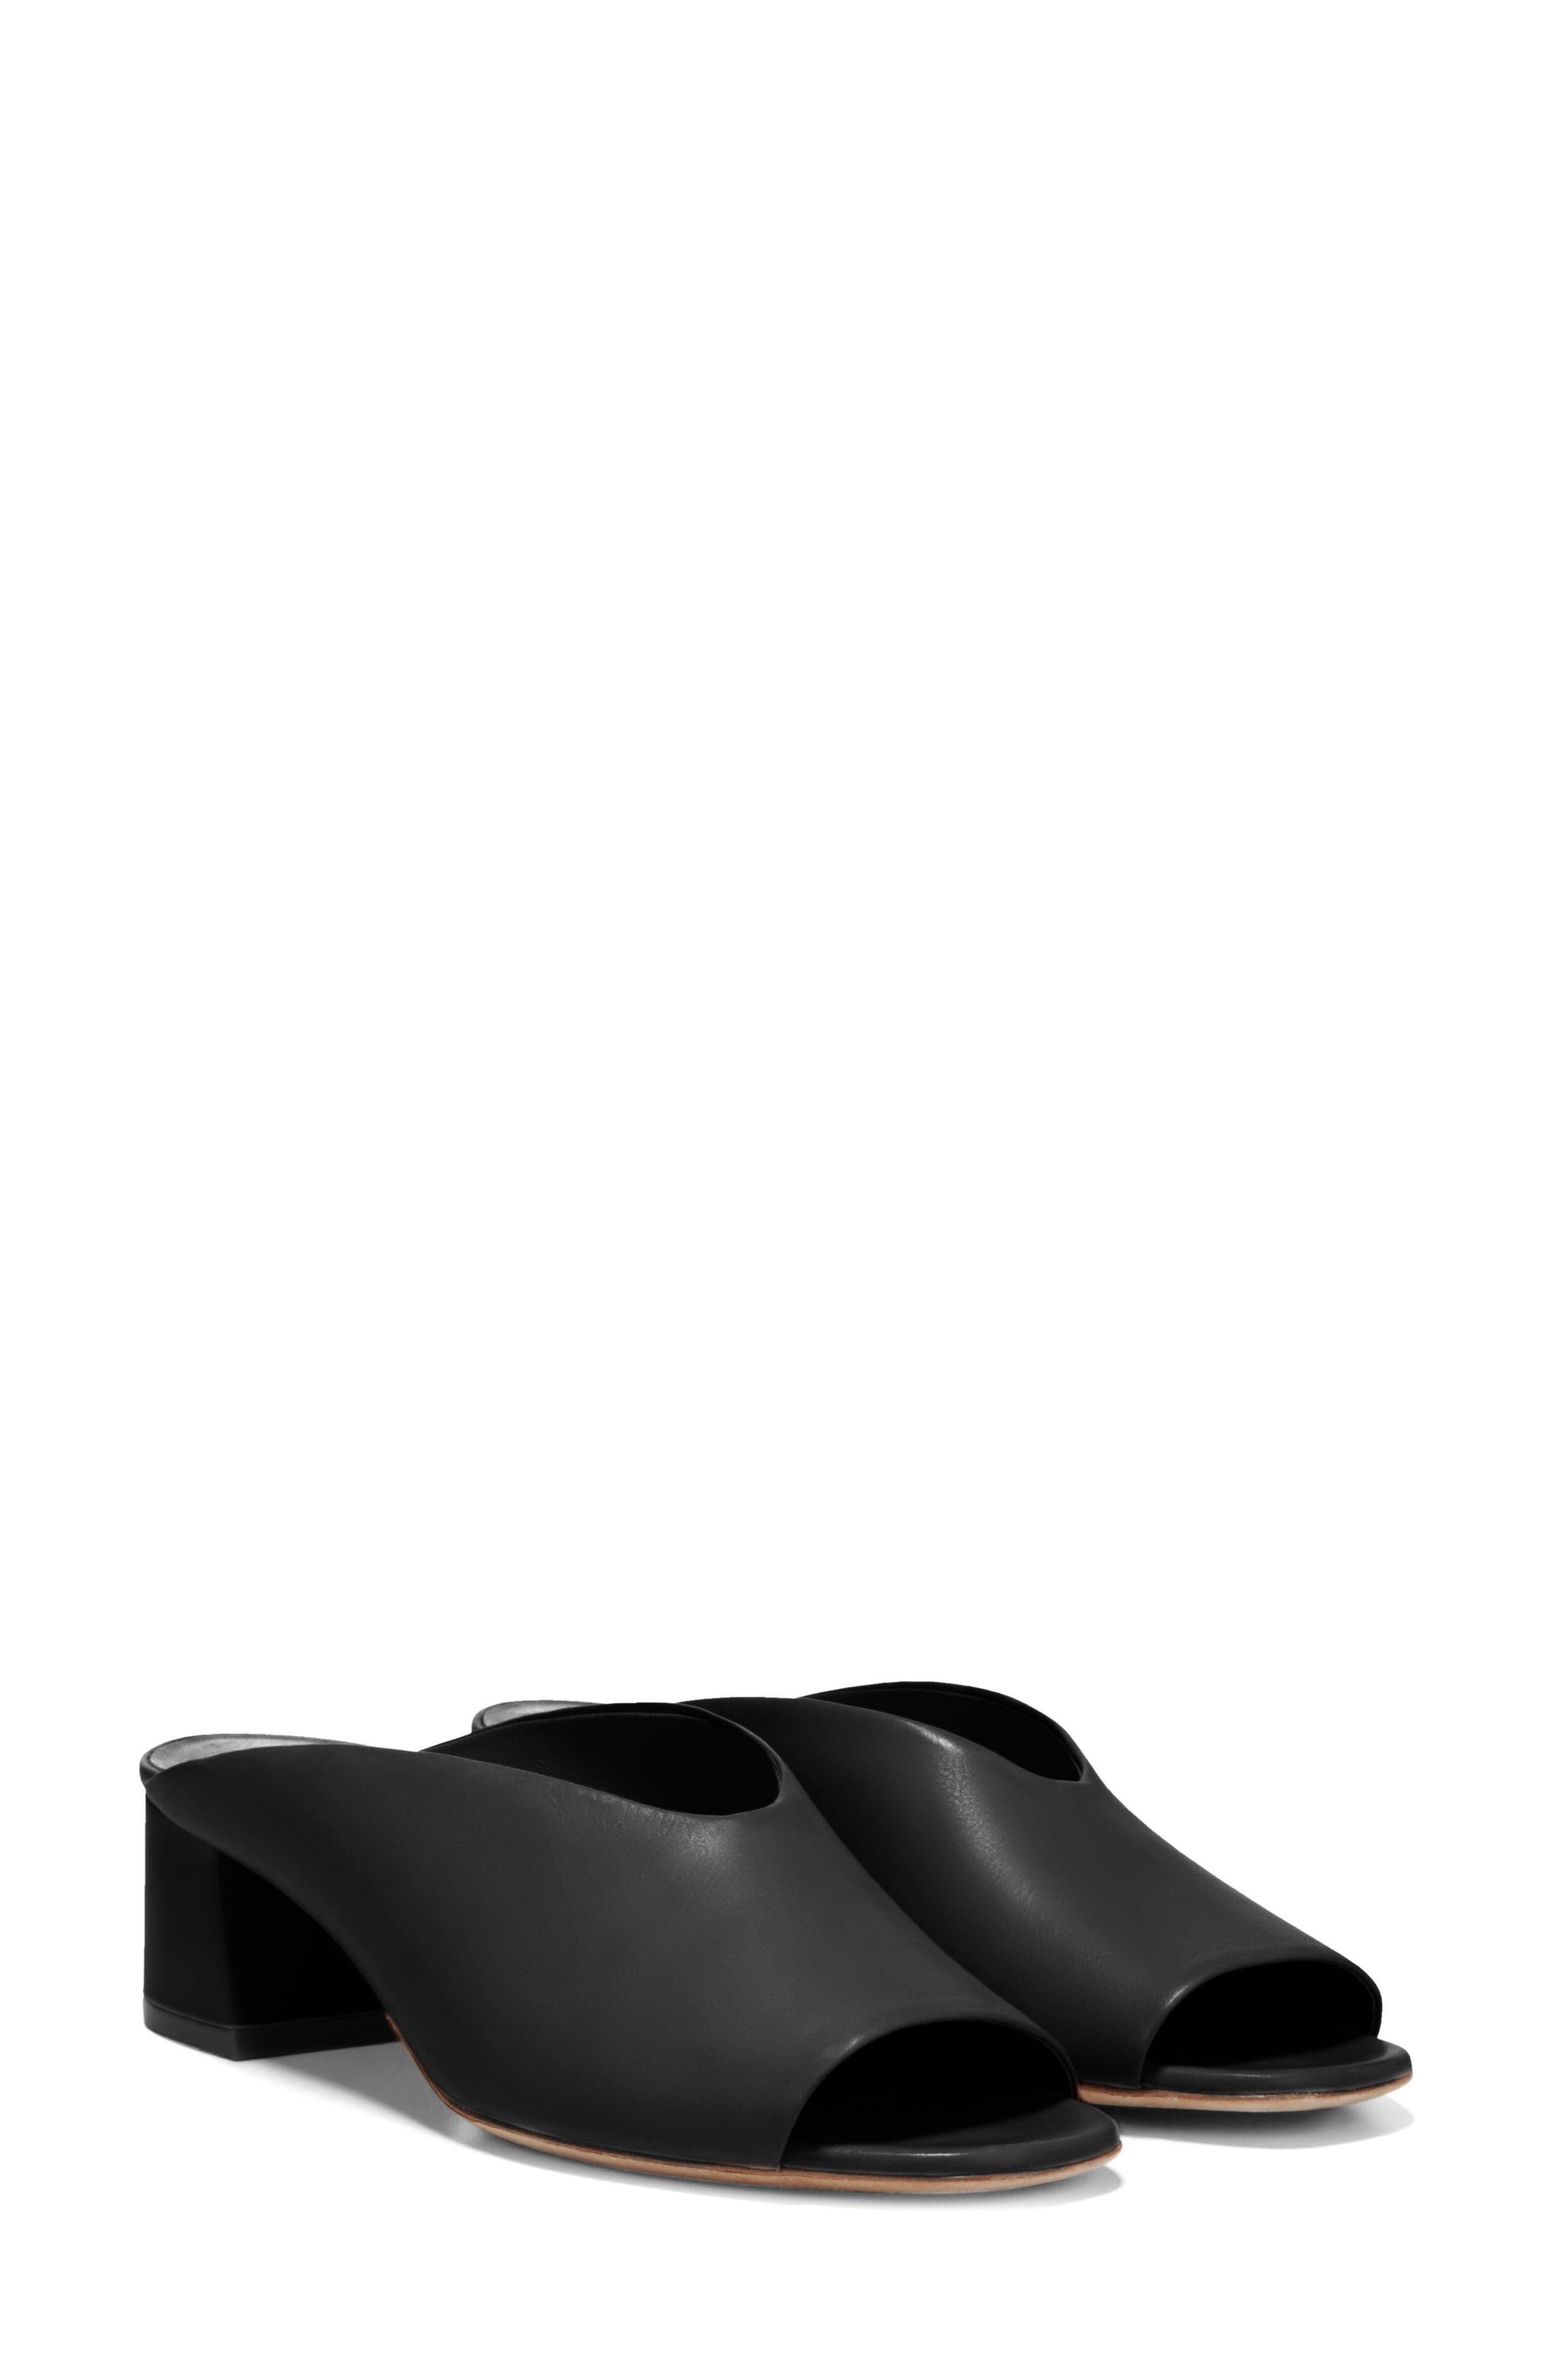 Cachet Sandal,                             Alternate thumbnail 6, color,                             BLACK SIVIGLIA CALF